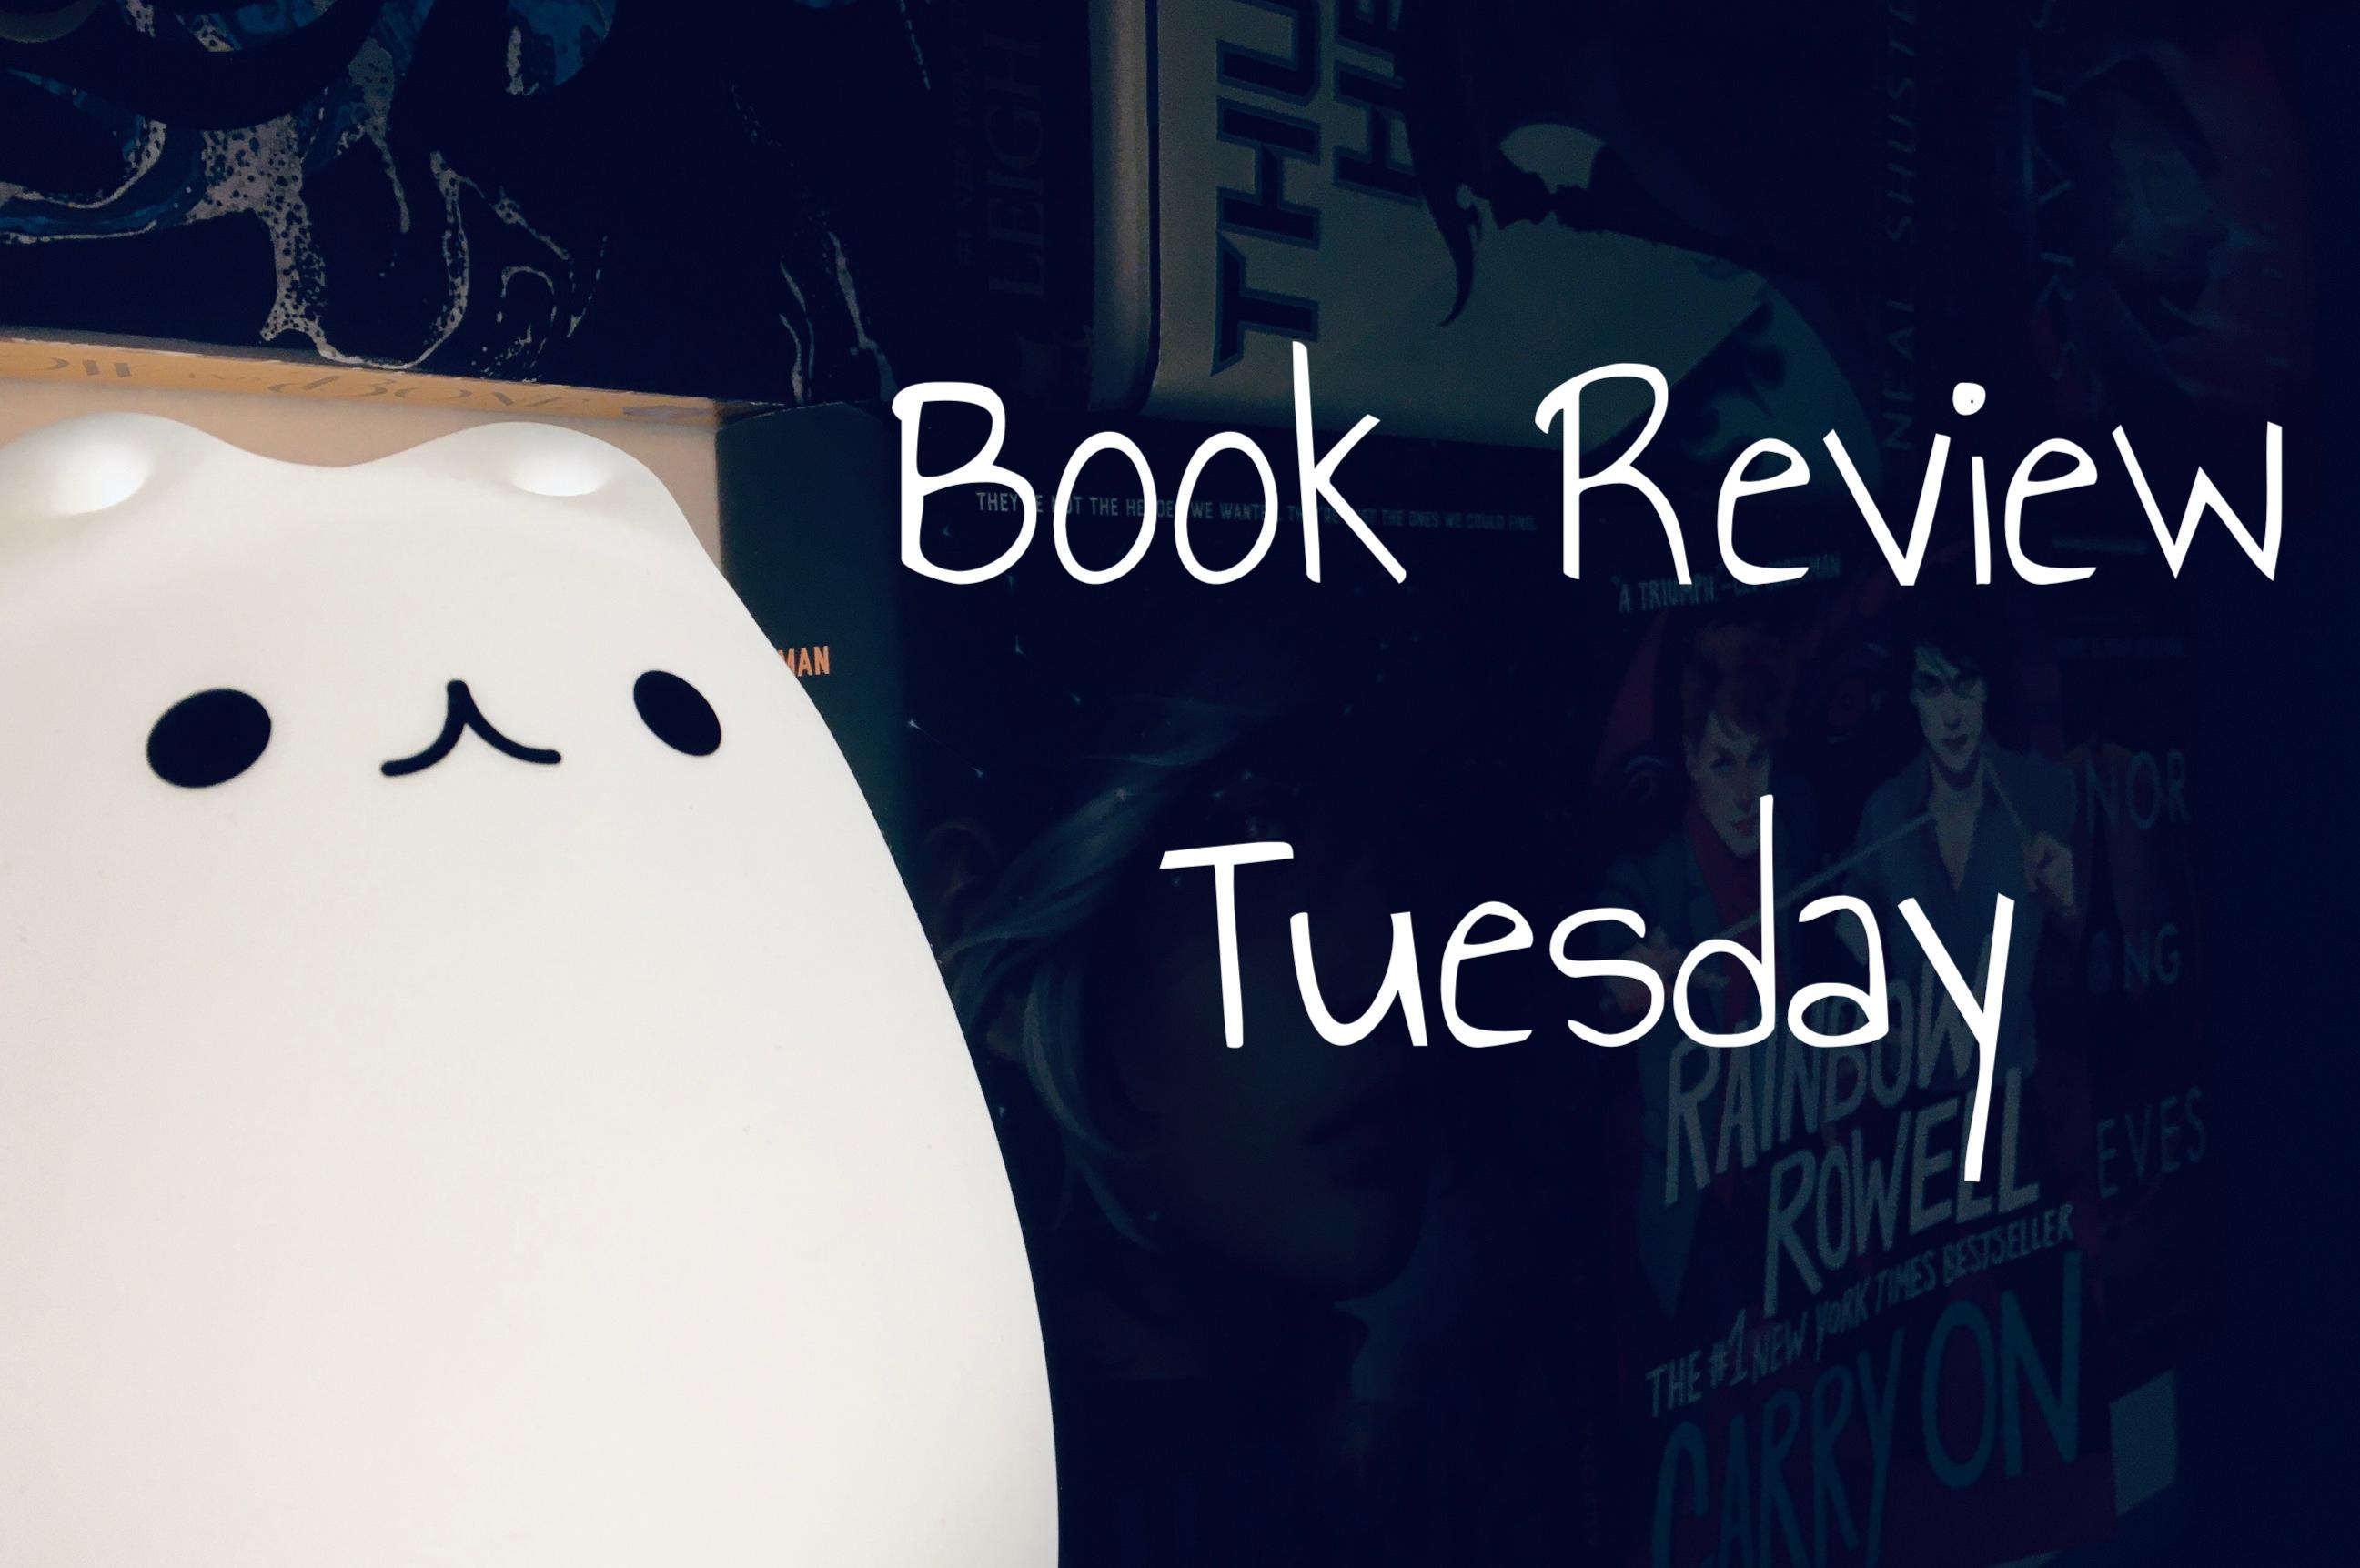 Book review tuesday header.jpeg